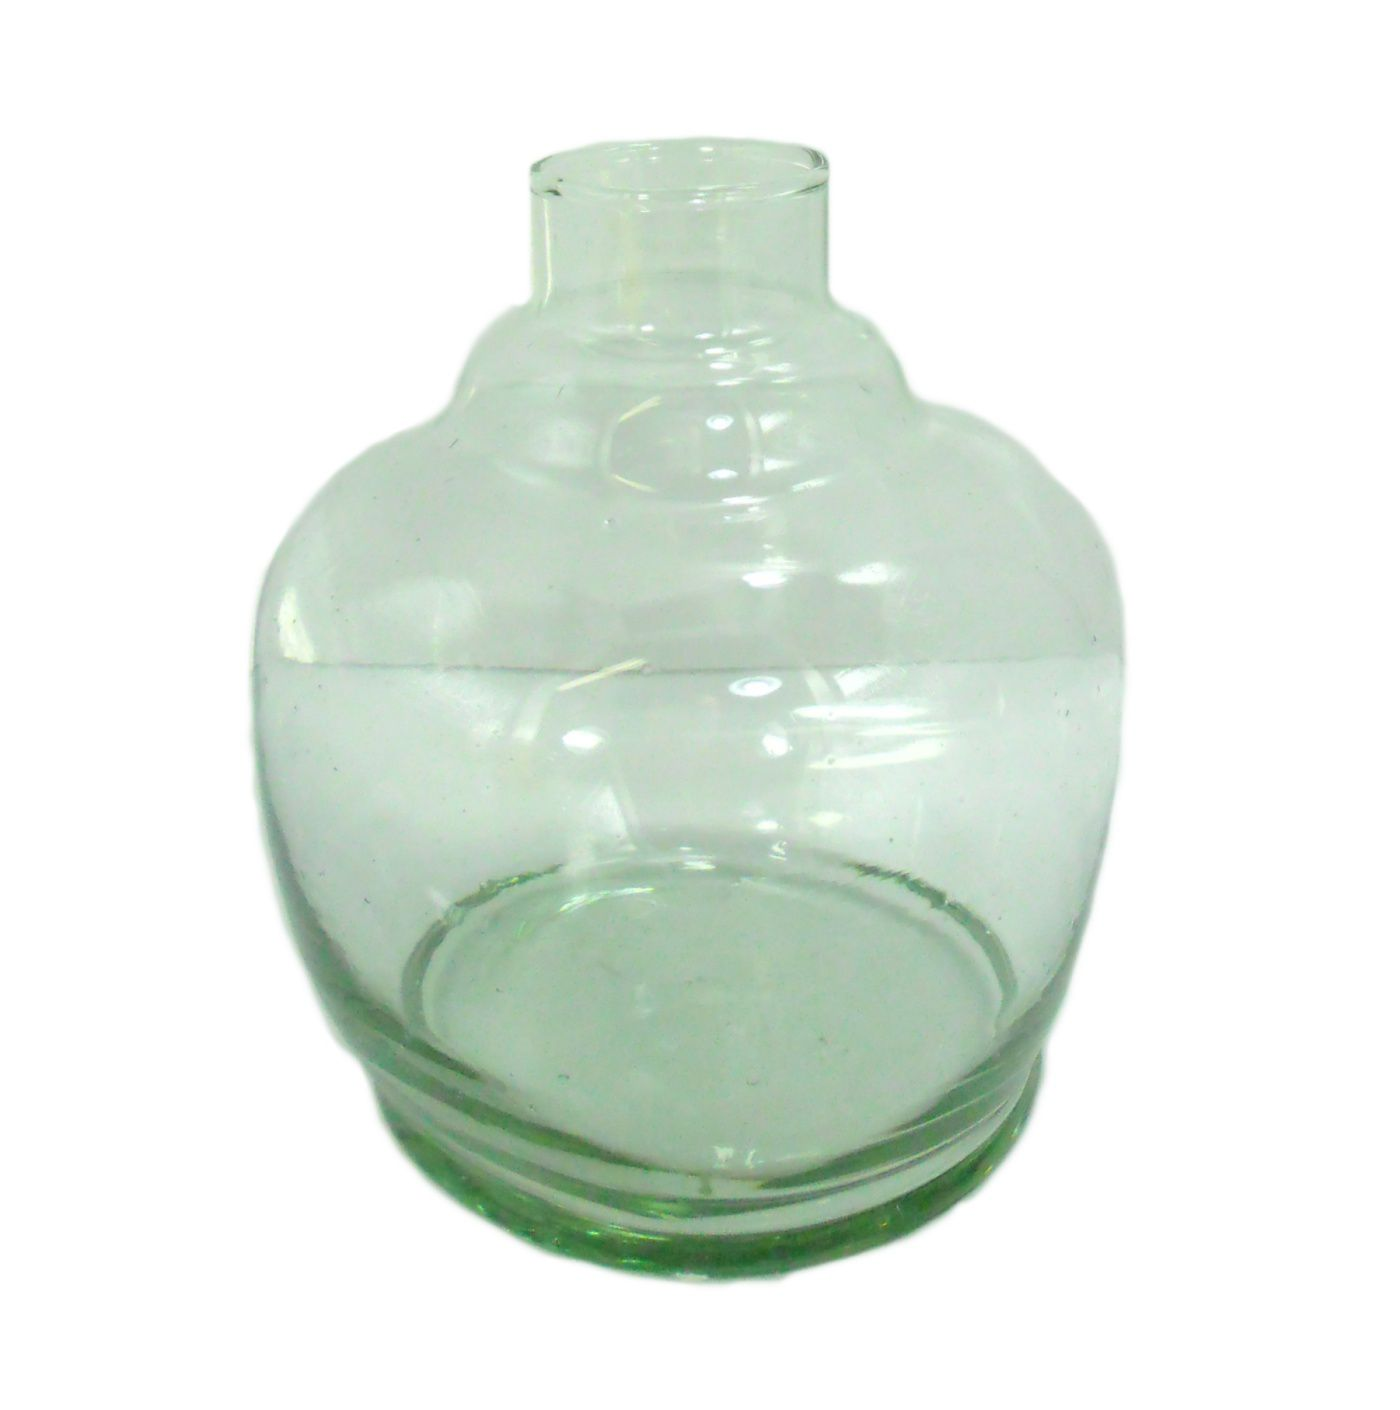 Vaso/base para narguile FULGORE, em vidro, formato PUMP. Altura 13cm. Bocal 3,7cm diâm.